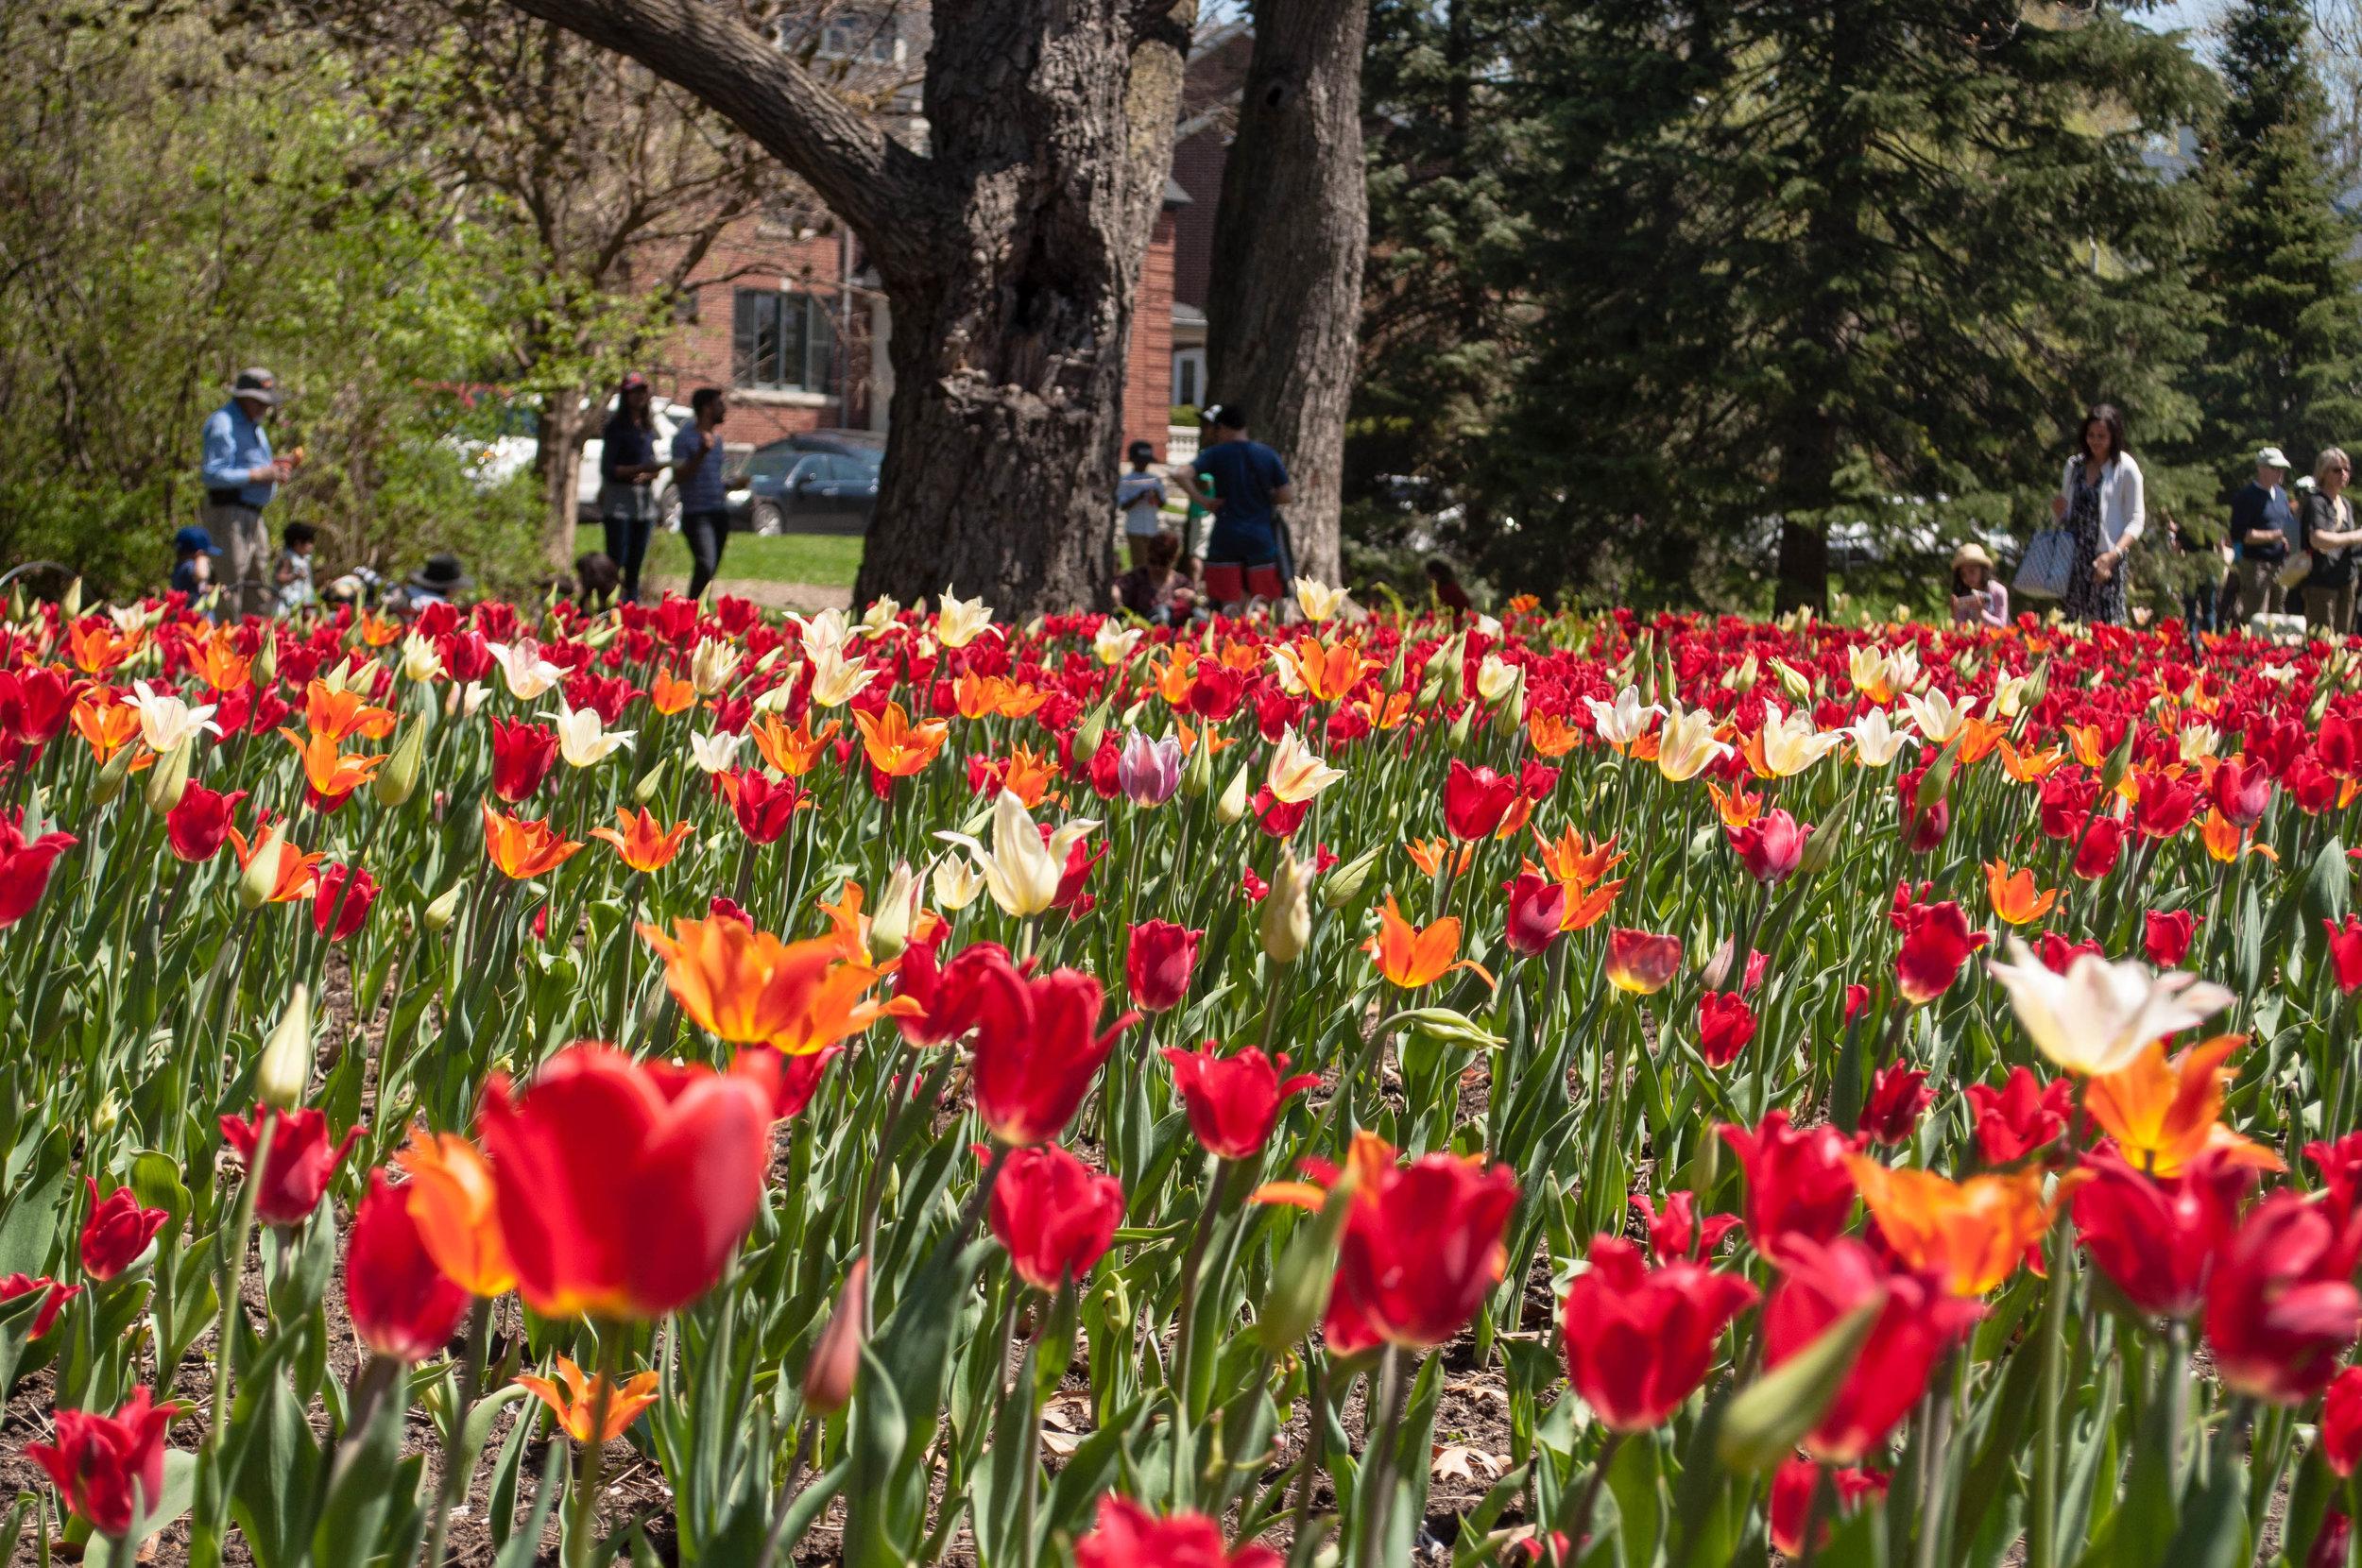 Tulips in the Canadian tulip festival in Ottawa